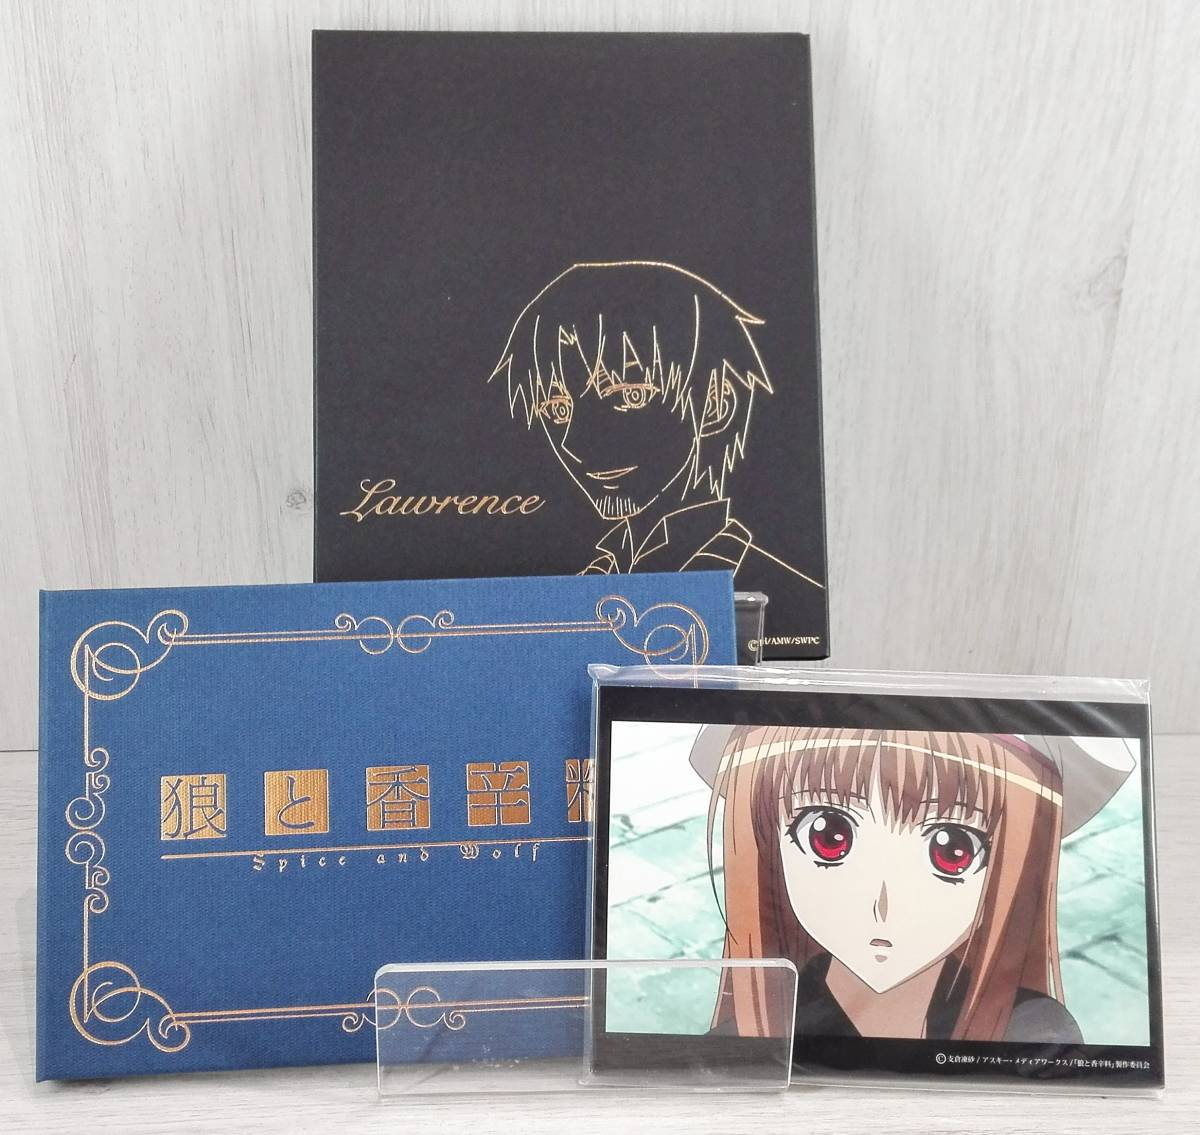 Blu-ray 帯あり 狼と香辛料 Blu-ray Disc BOX 店舗受取可_画像5